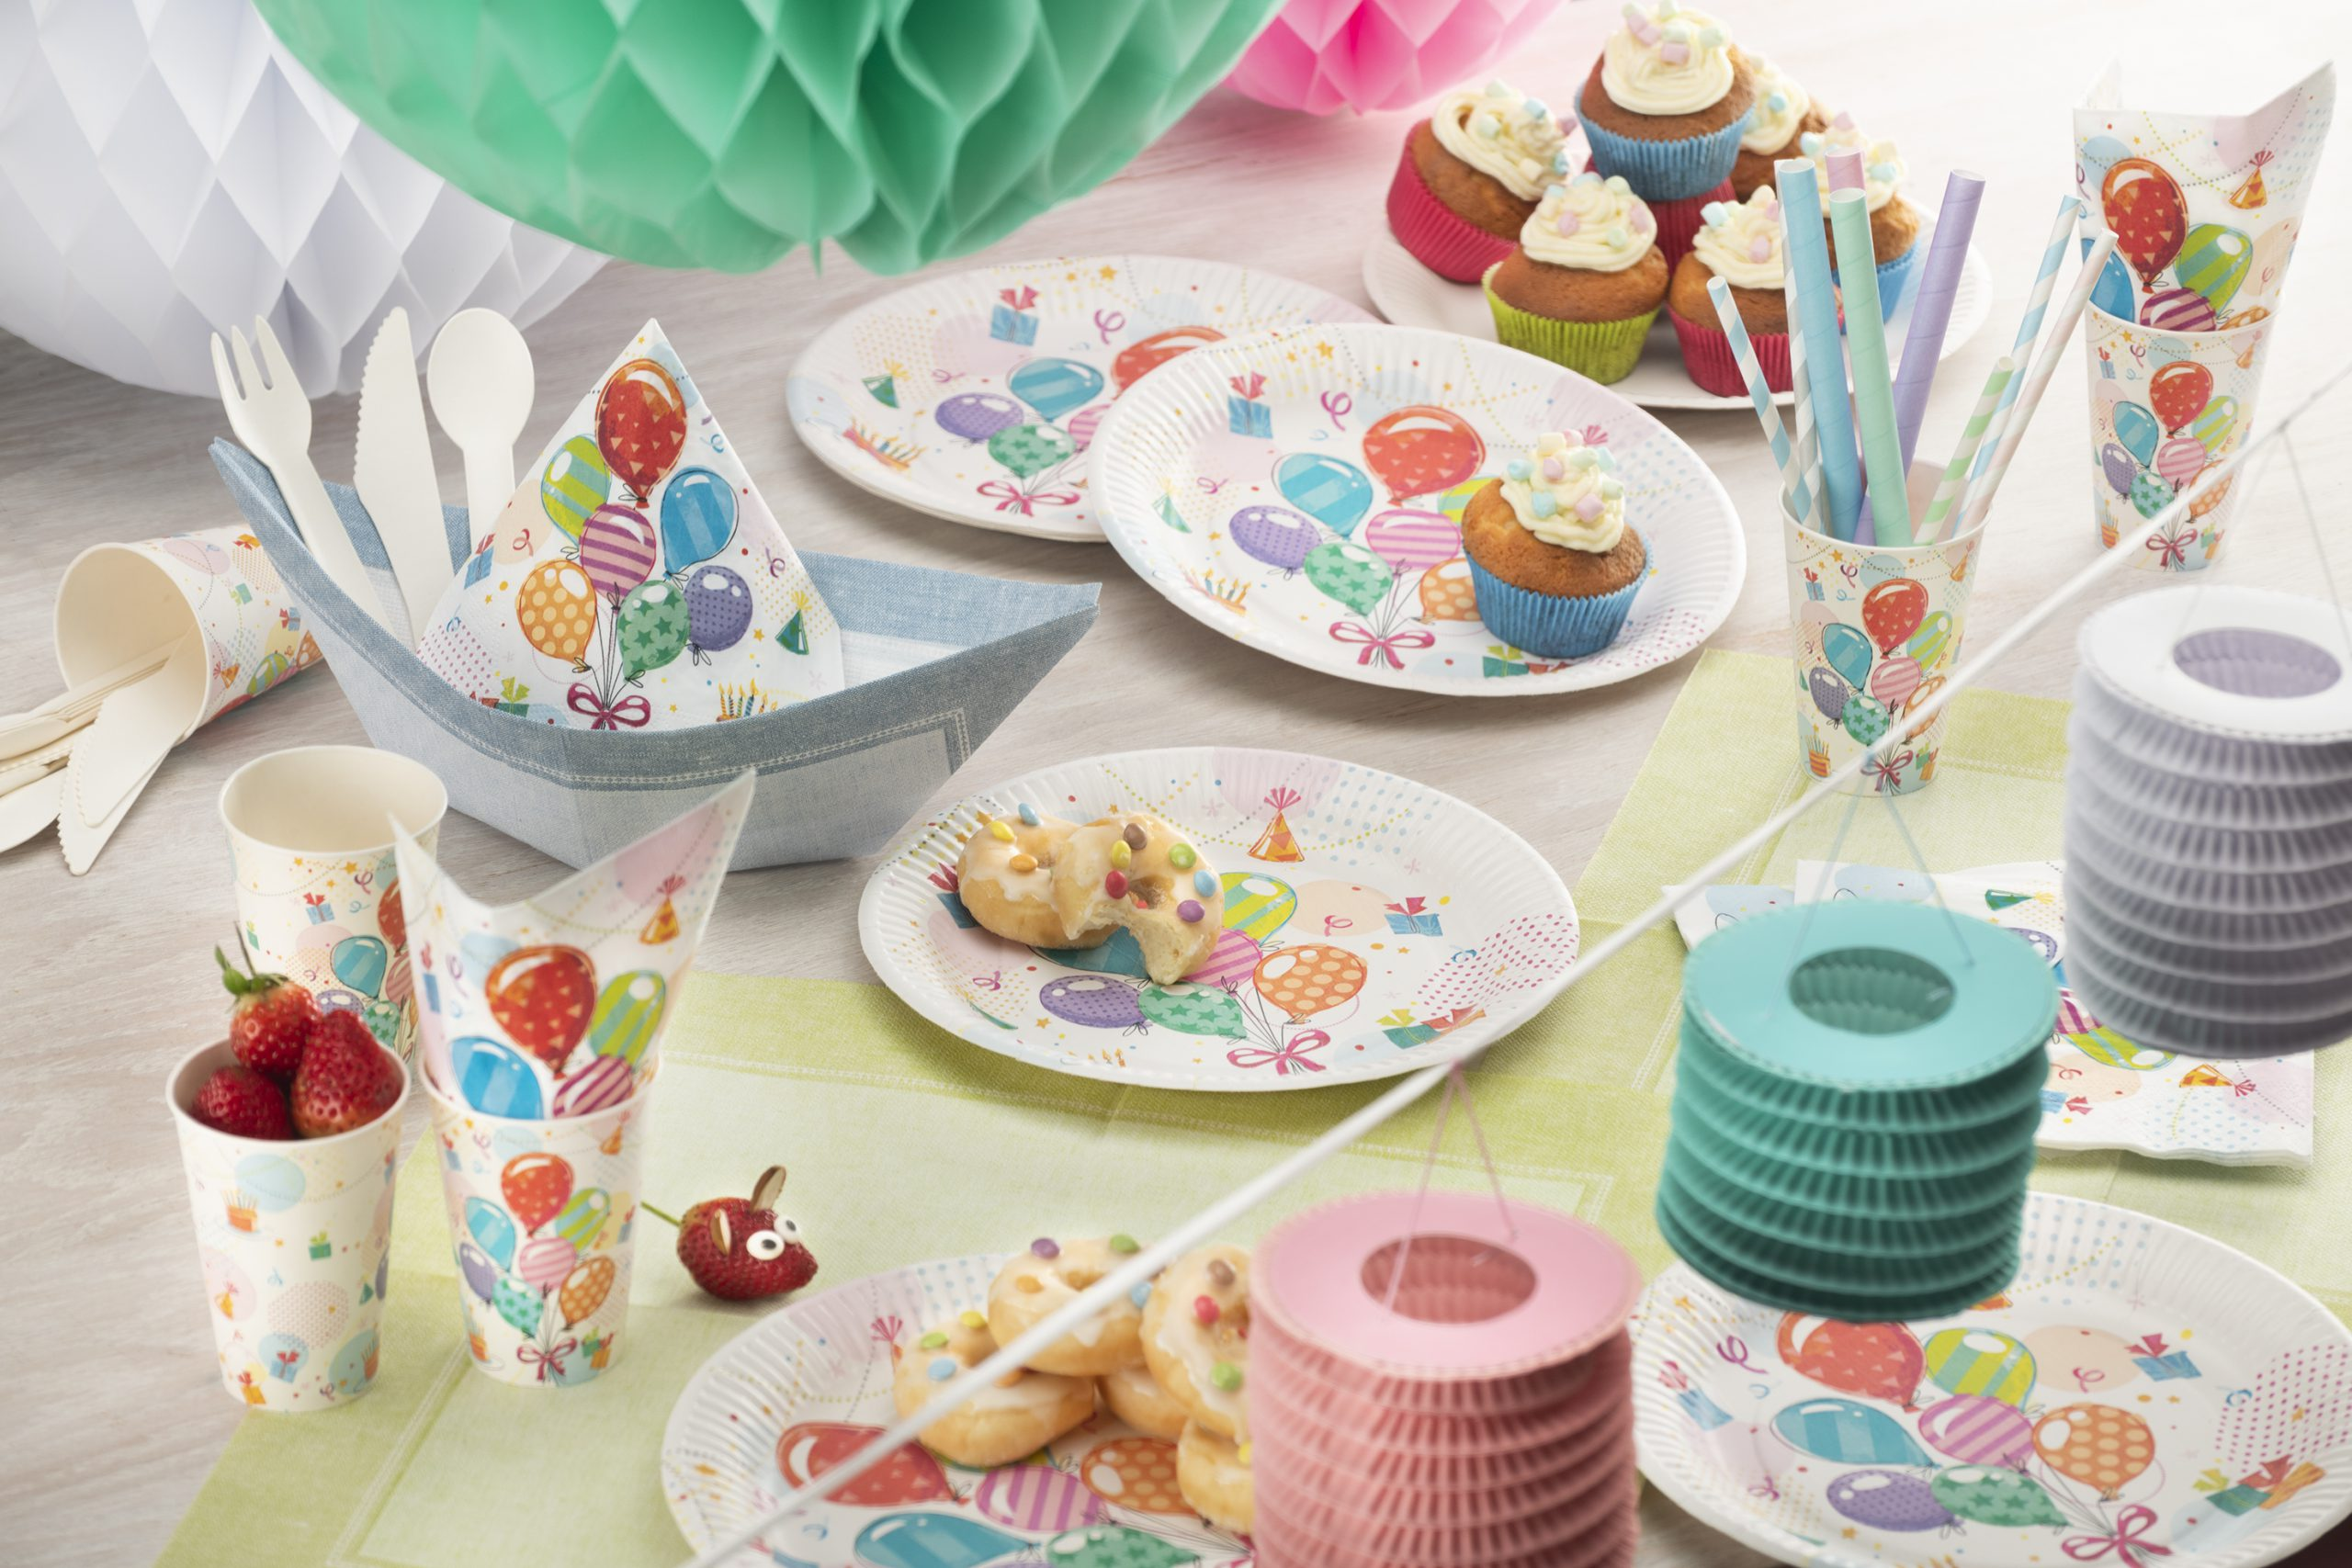 plastic-free-party-disposables-conpax